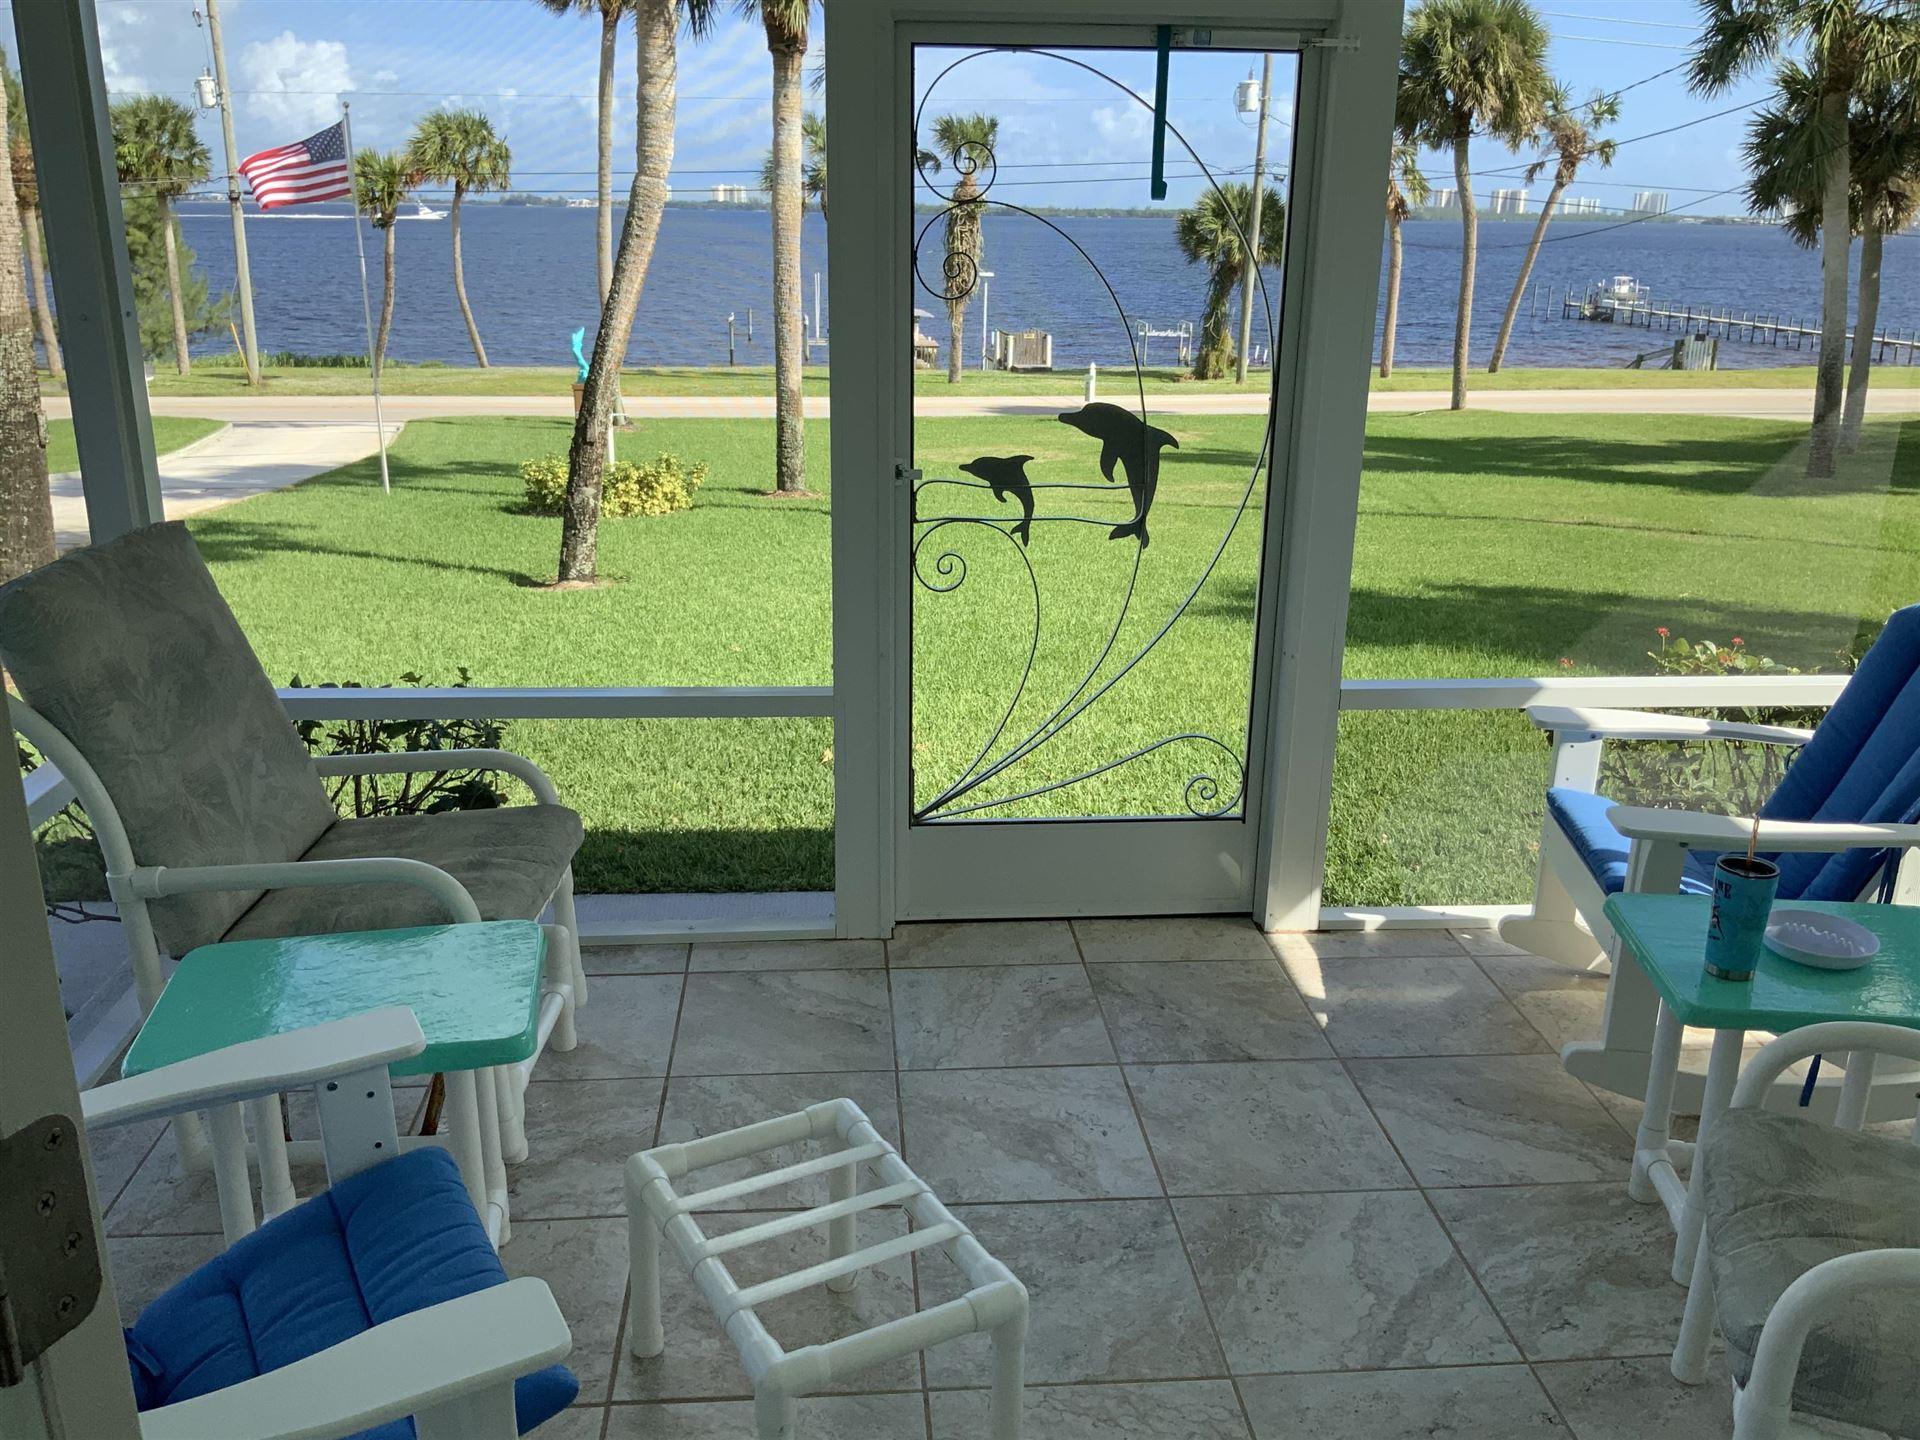 12063 S Indian River Drive Drive, Jensen Beach, FL 34957 - #: RX-10693980